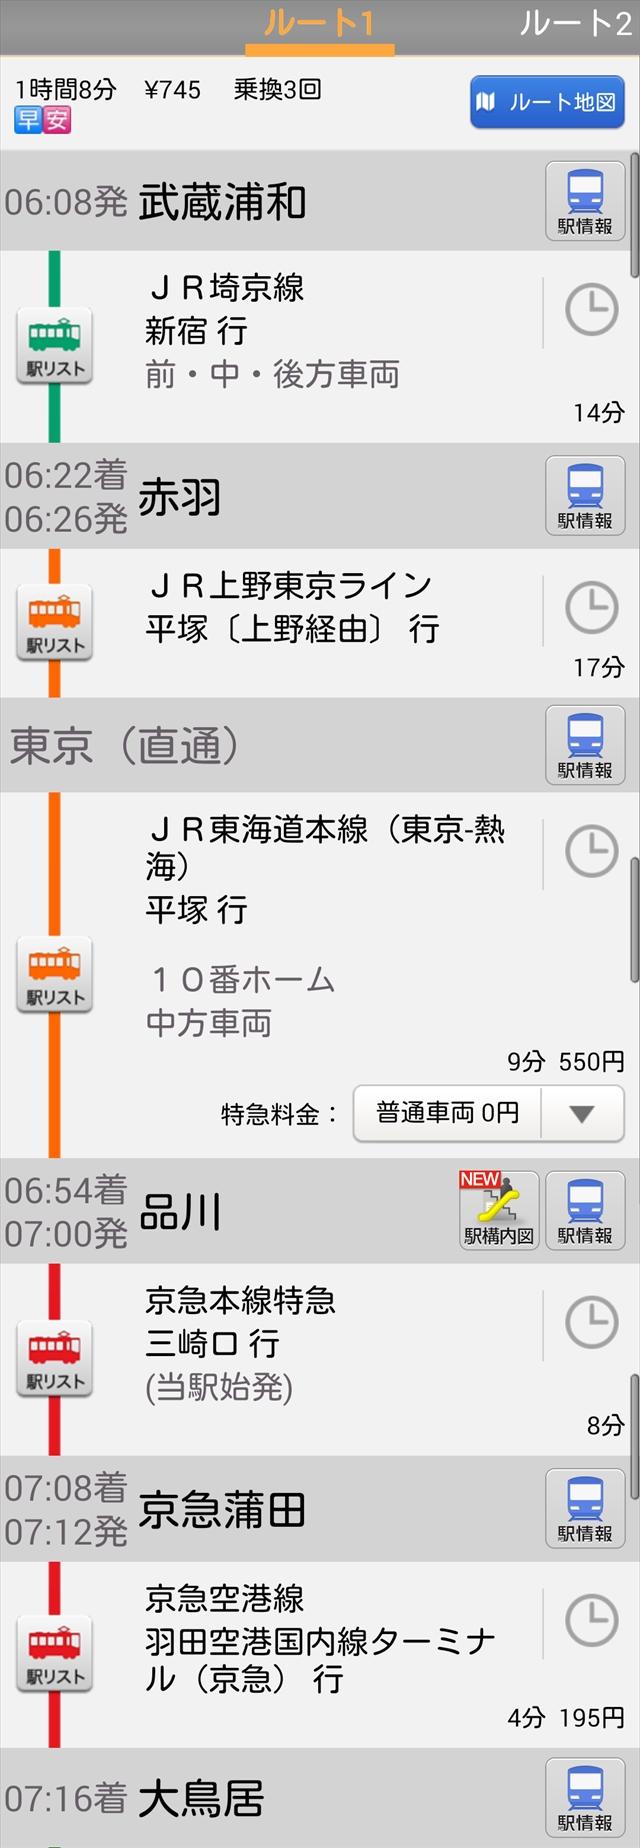 往路上野意東京ライン